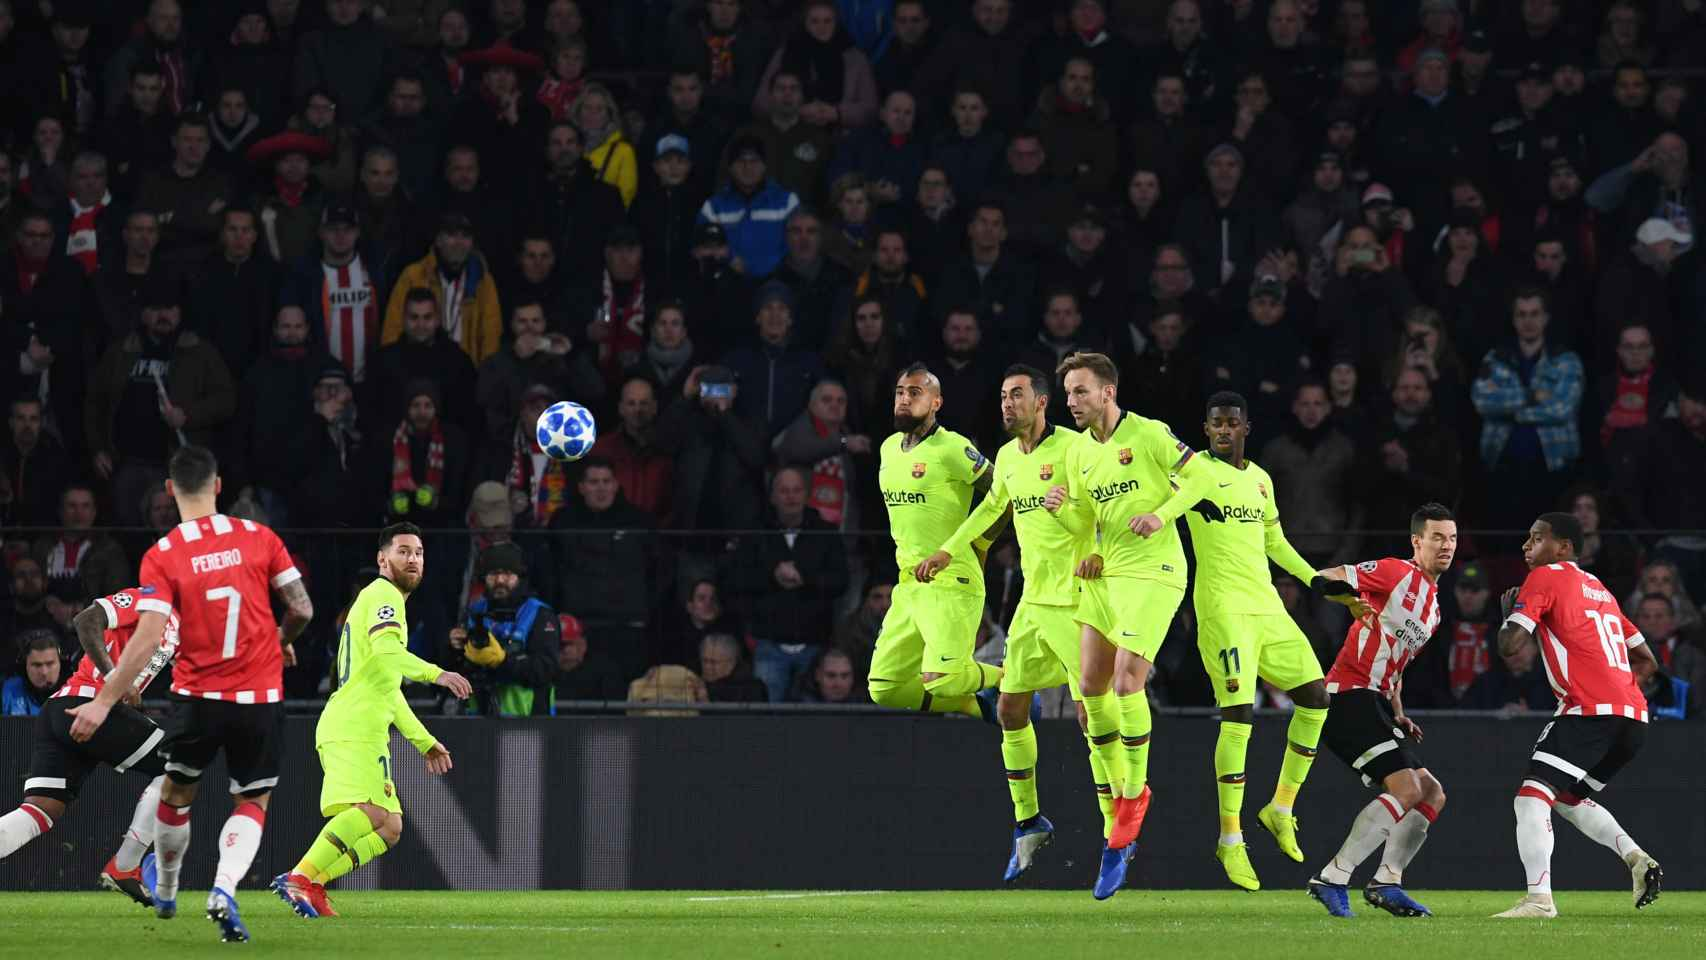 PSV Eindhoven - Barcelona